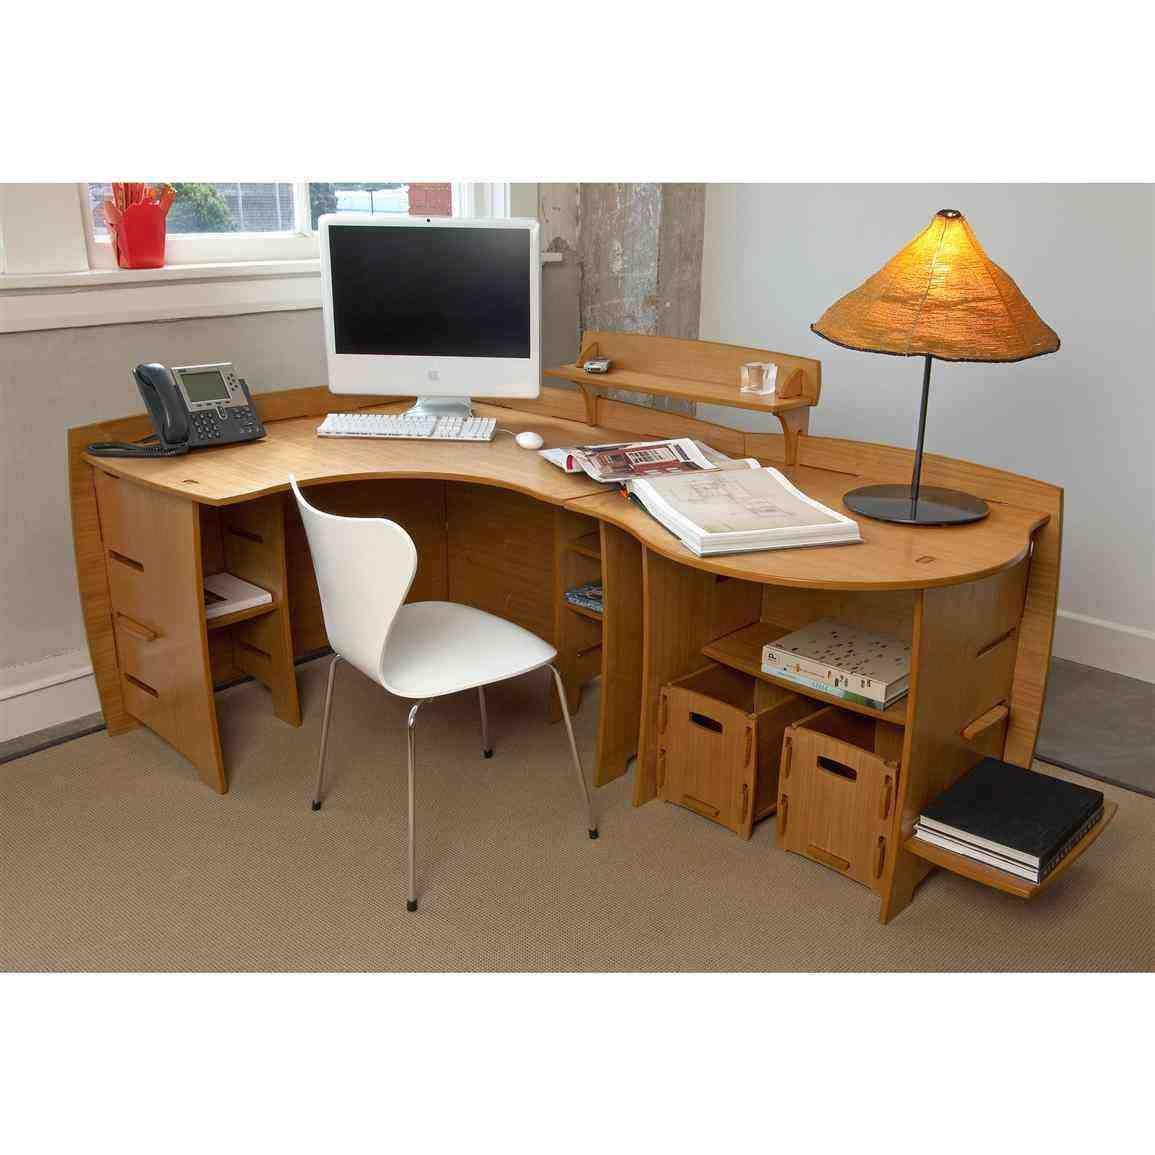 Legare Corner Desk Staples Office Furniture, Modular Home Office Furniture, Home  Office Desks,